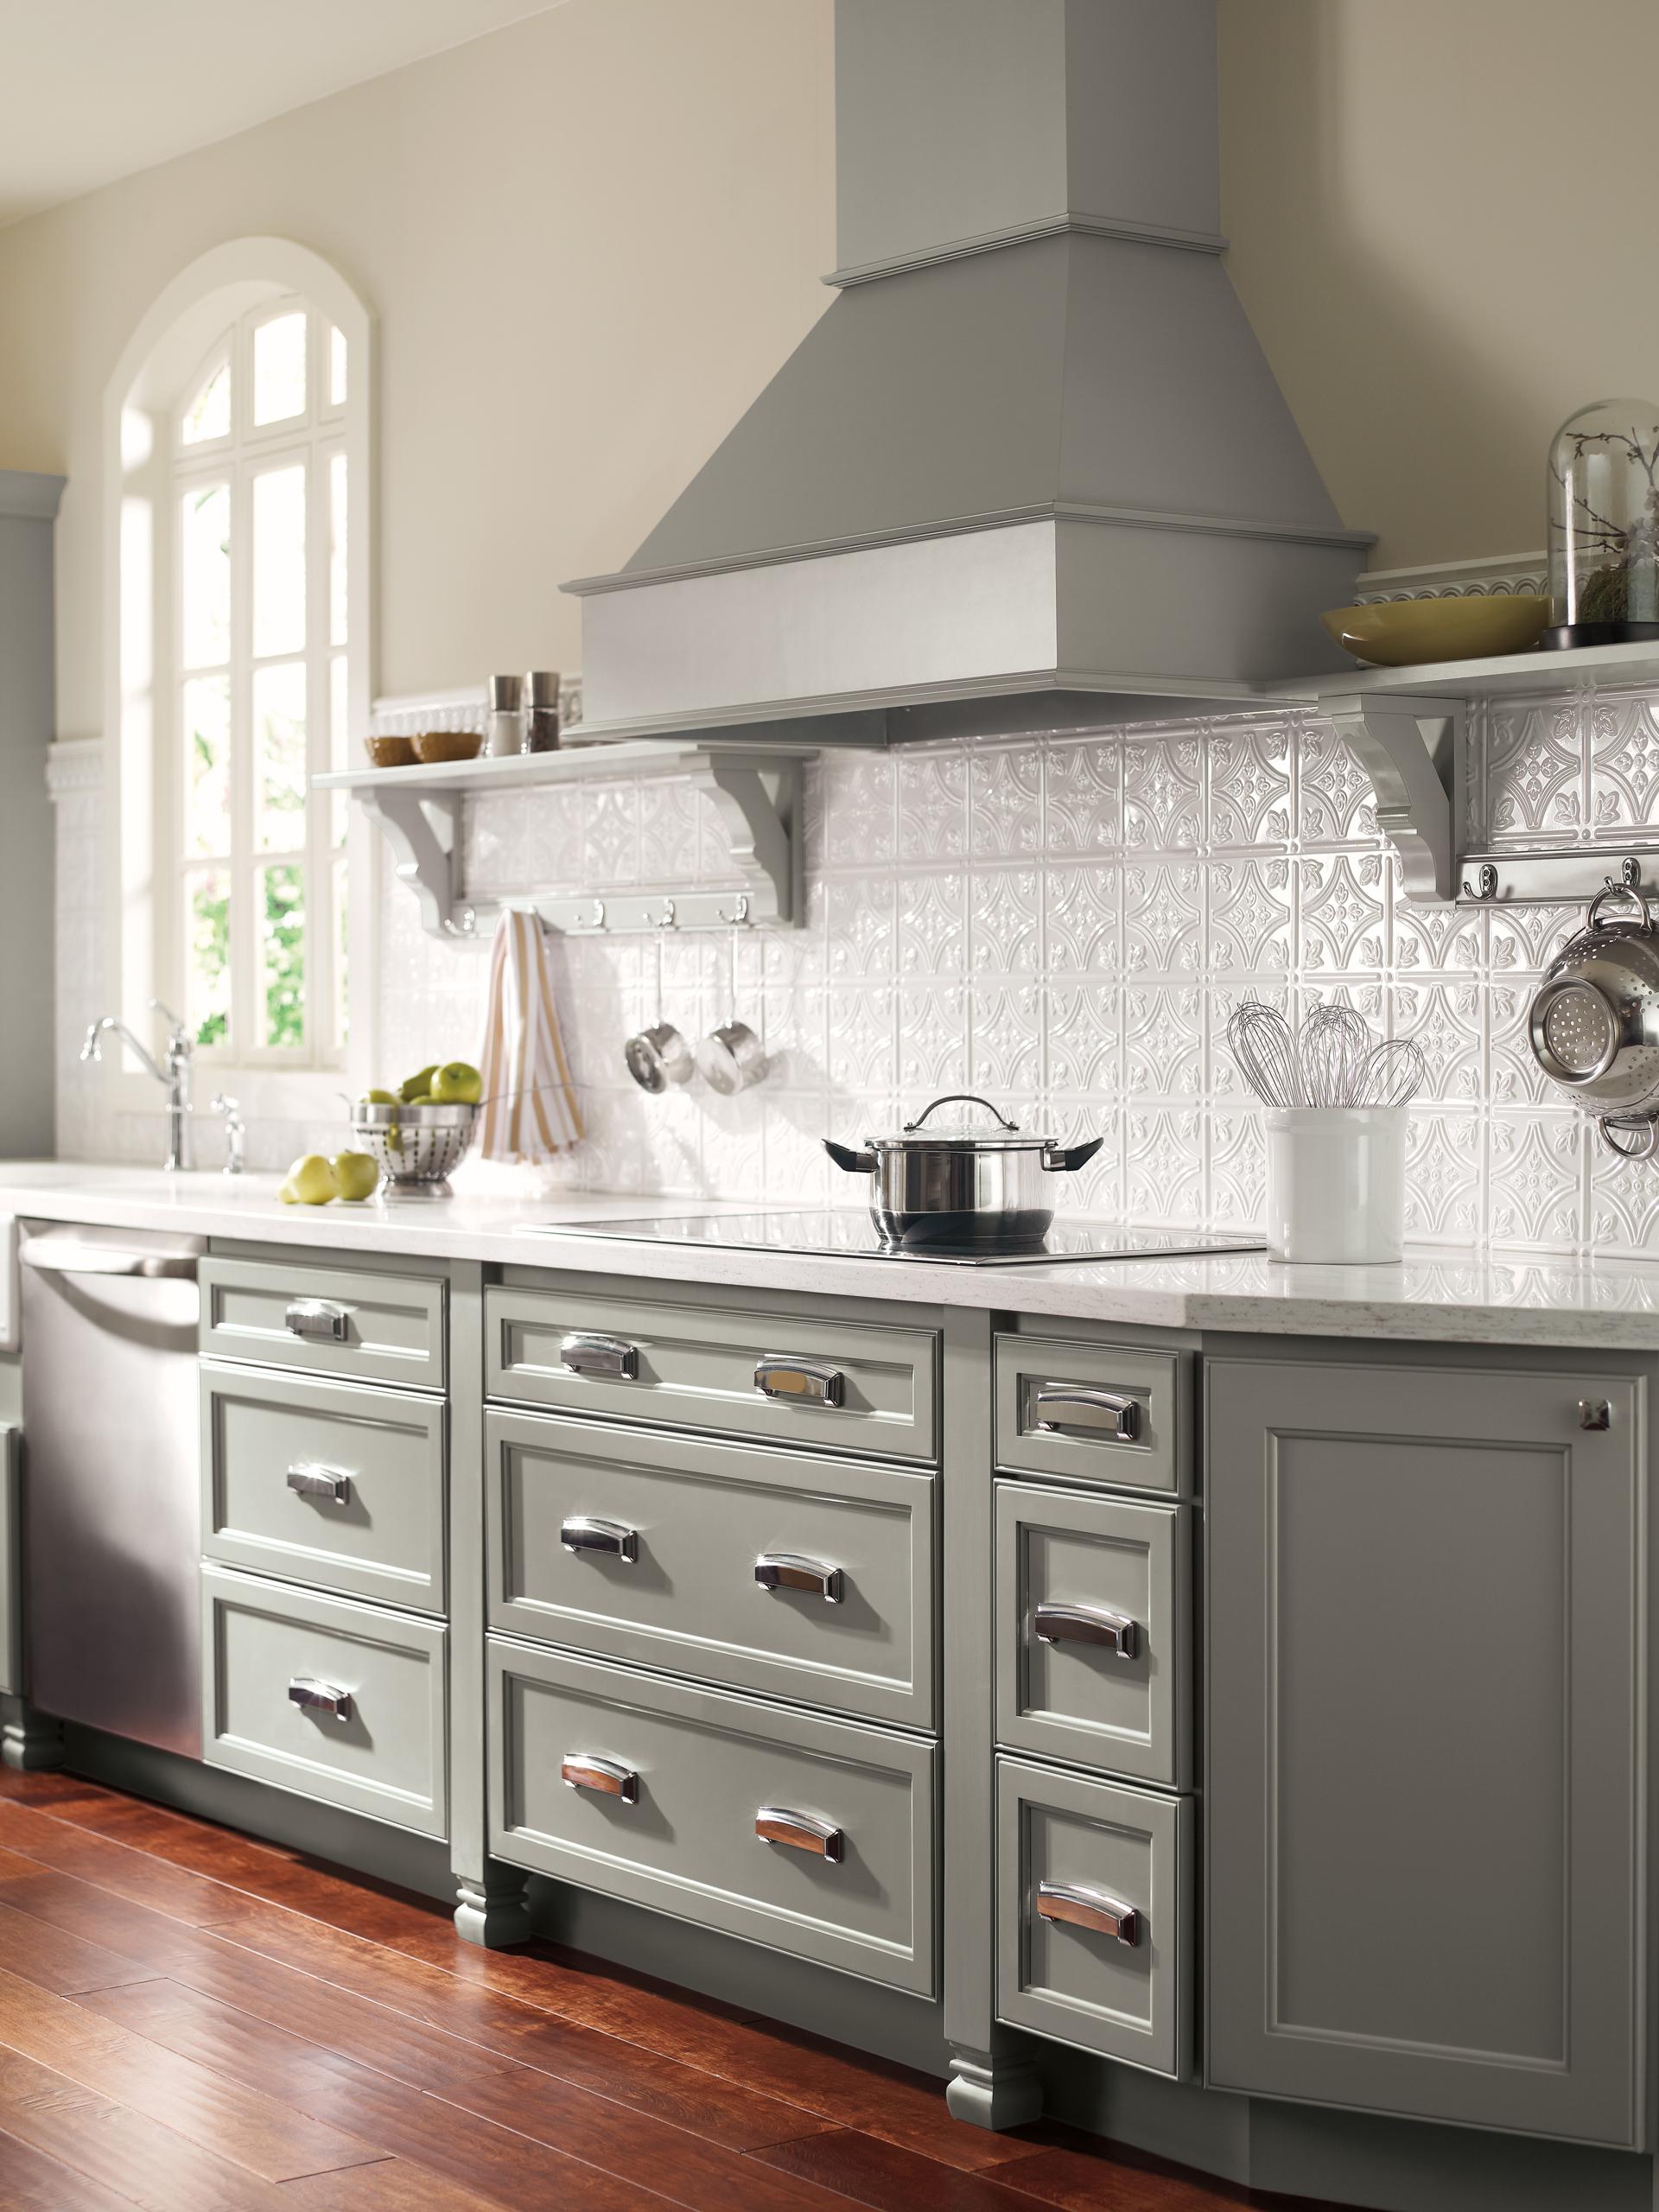 Homecrest Brenner Willow Kitchen Cabinetry